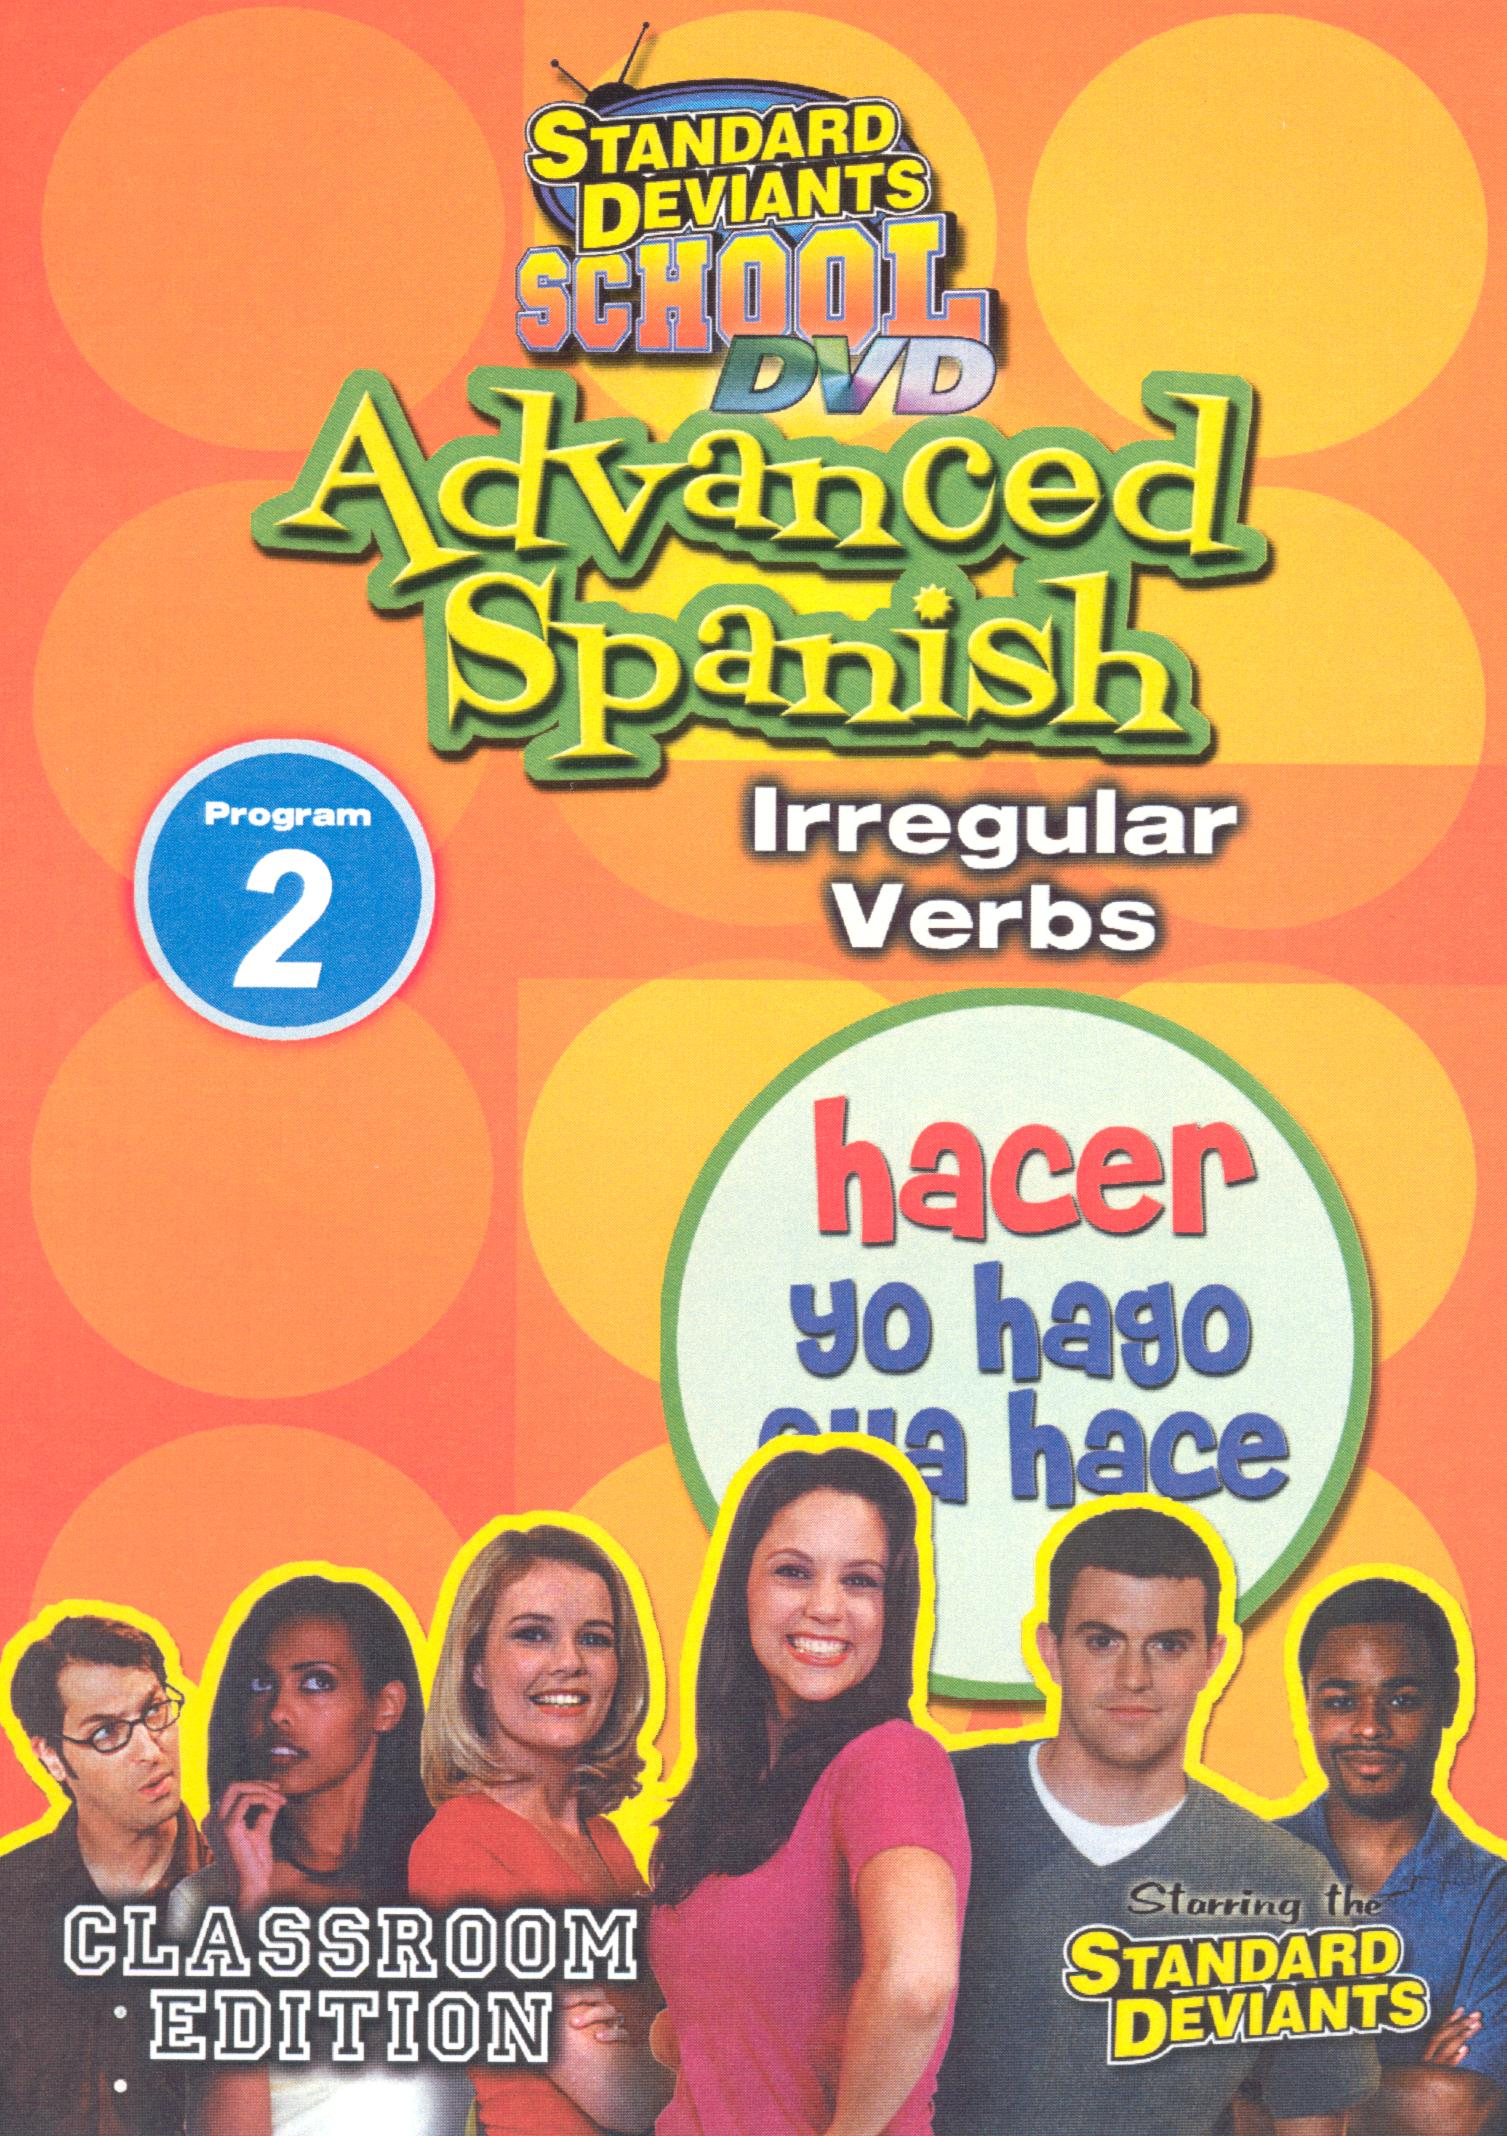 Standard Deviants School: Advanced Spanish, Program 2